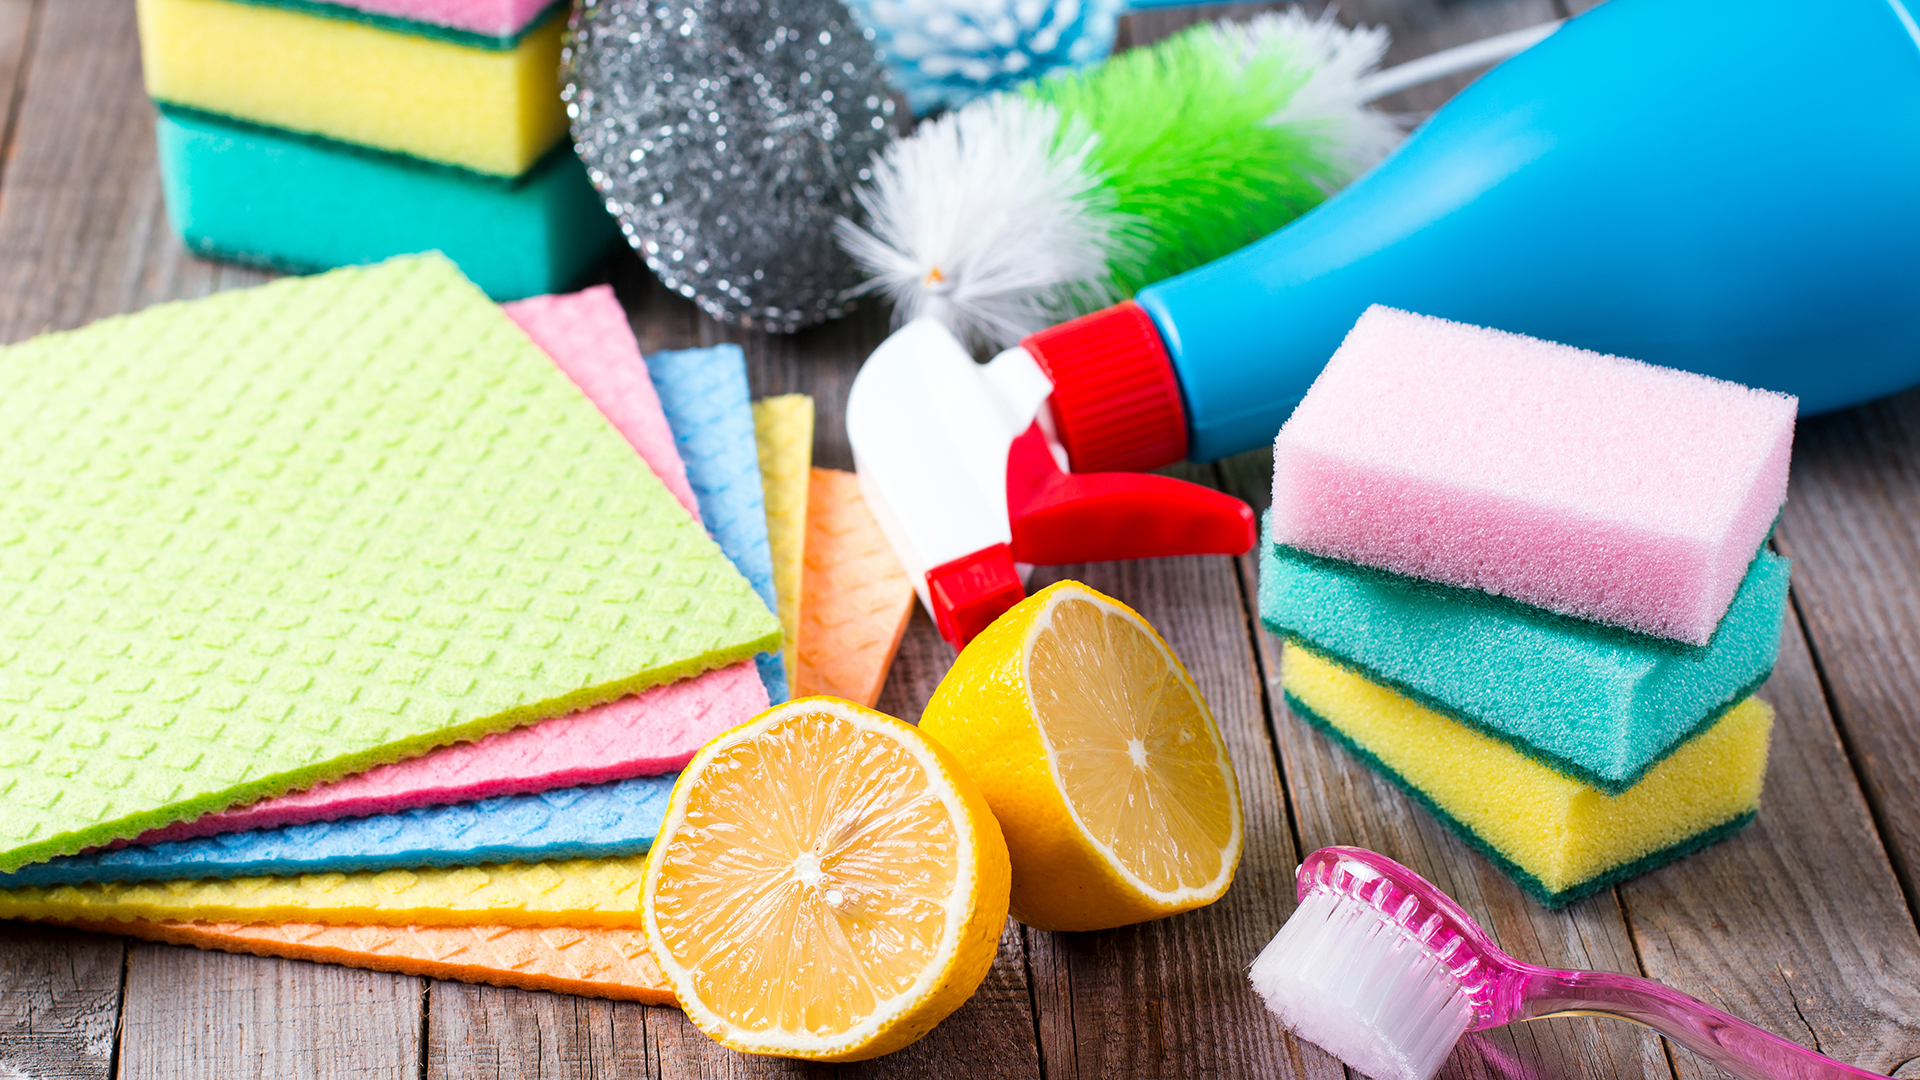 eco-friendly-cleaning-supplies-today-180309-tease_084f3ed170fce3b4c5cc8717863cd3ac.jpg